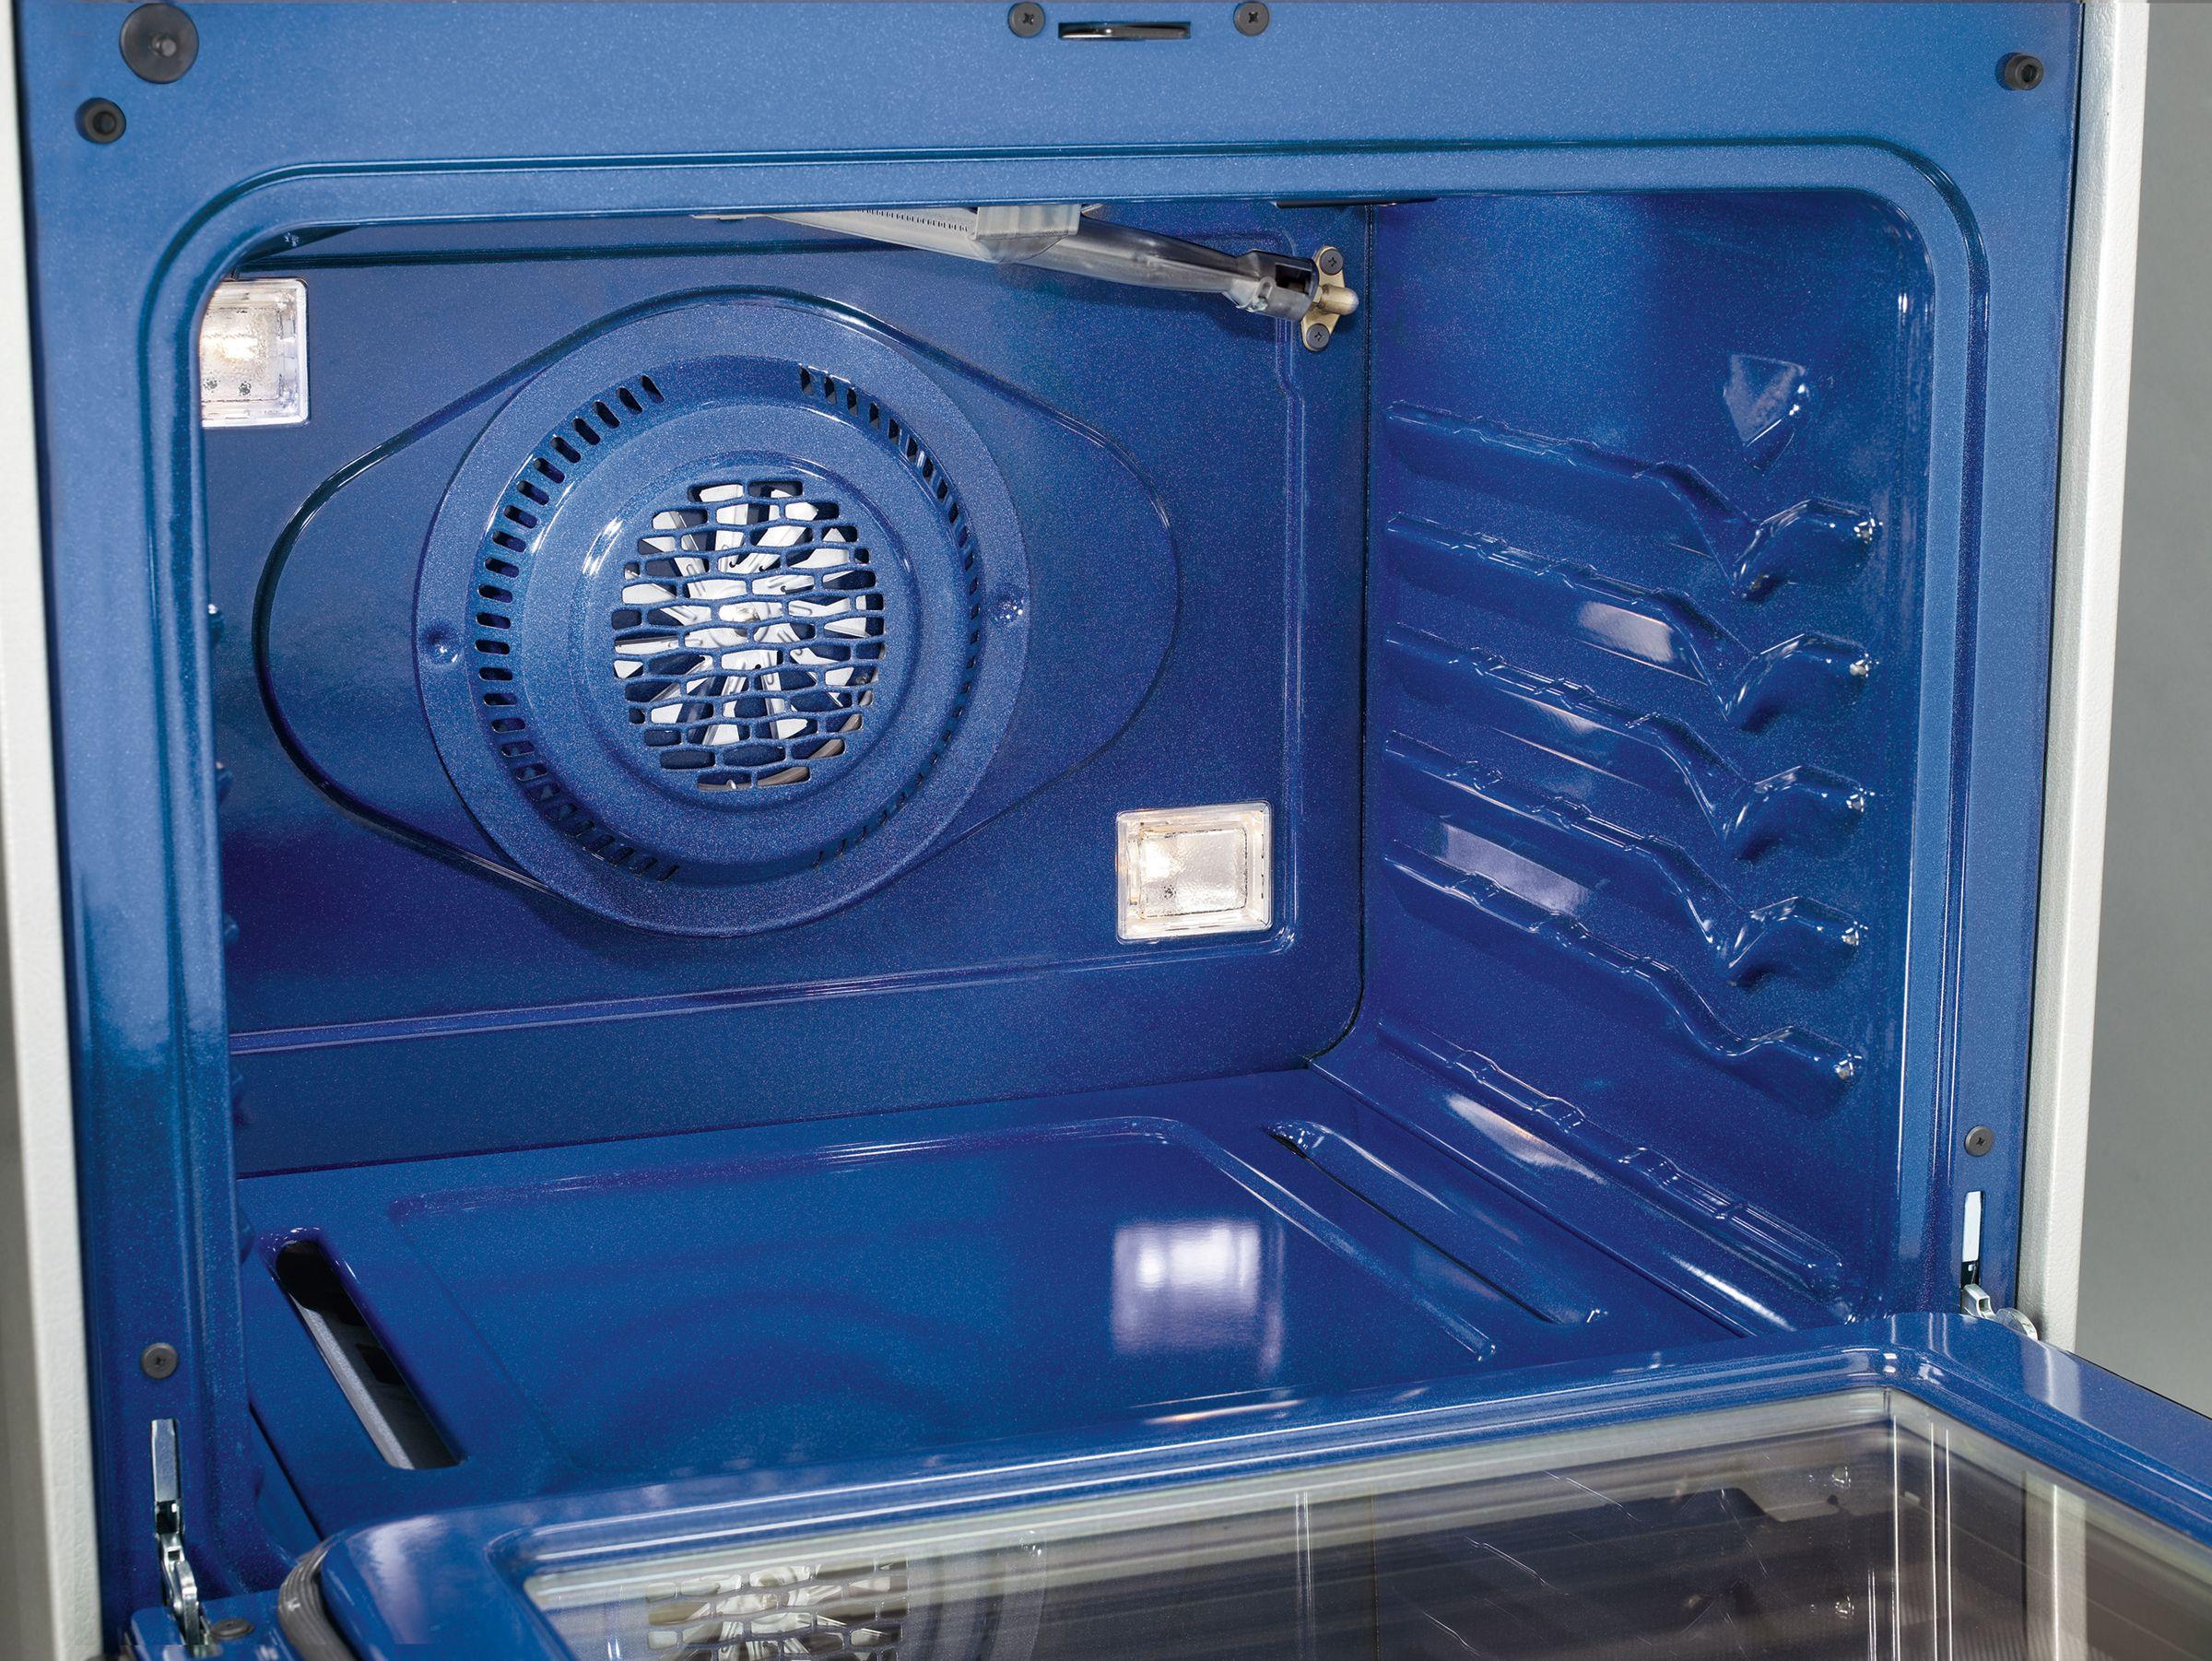 "Electrolux 30"" Freestanding Gas Range - Stainless Steel"